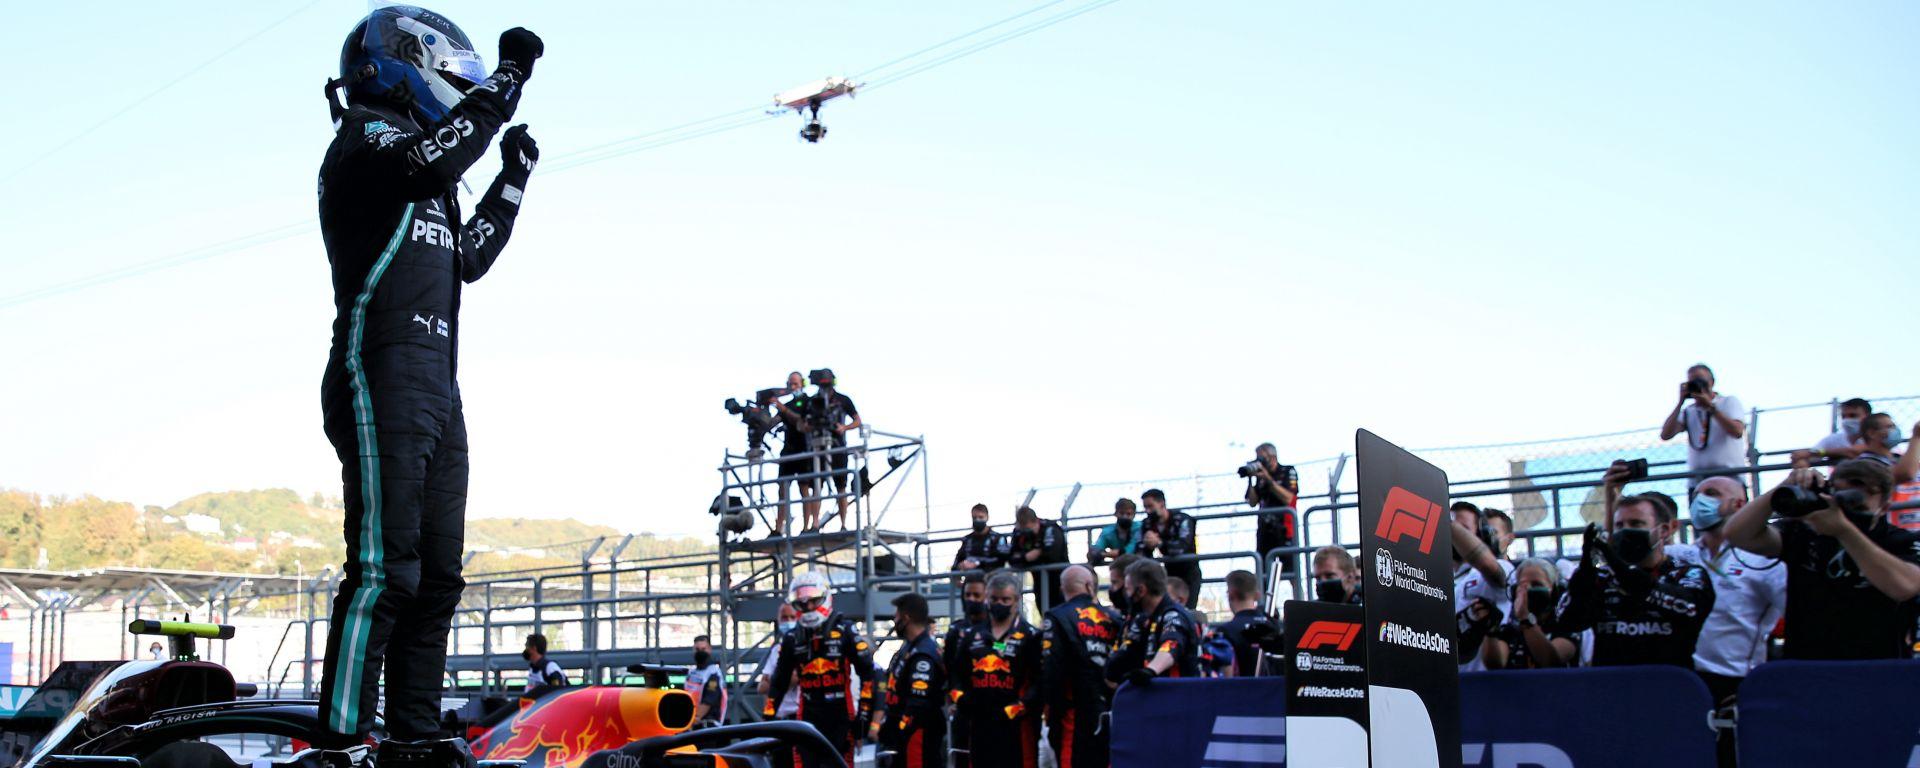 F1 GP Russia 2020, Sochi: Valtteri Bottas (Mercedes AMG F1) festeggia la vittoria